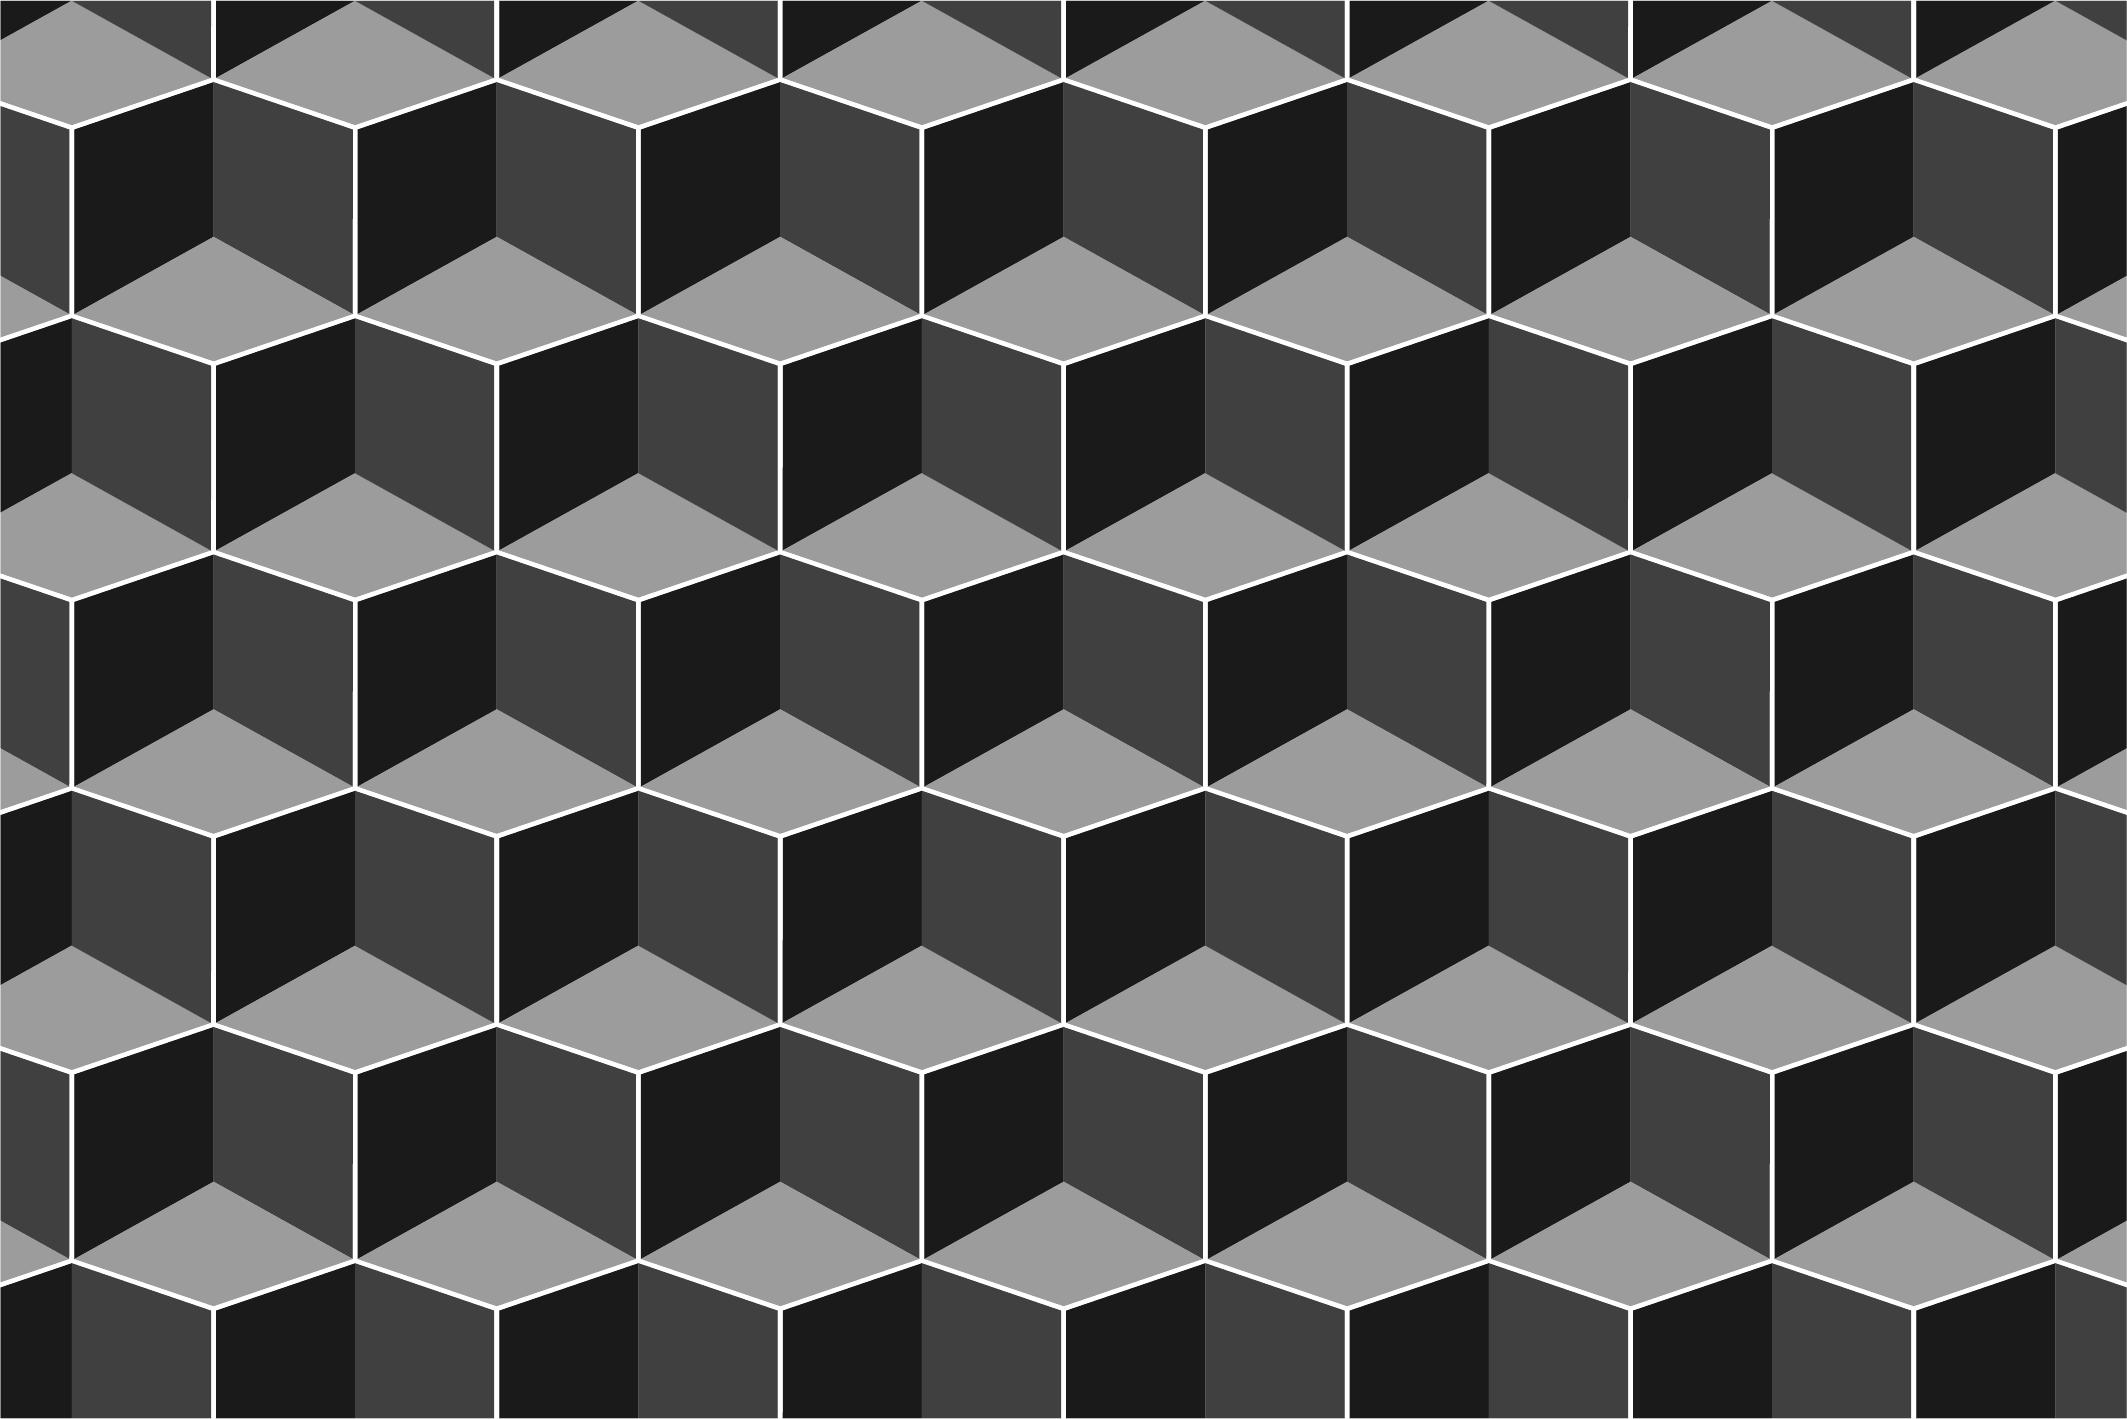 Dark seamless geometric textures example image 4